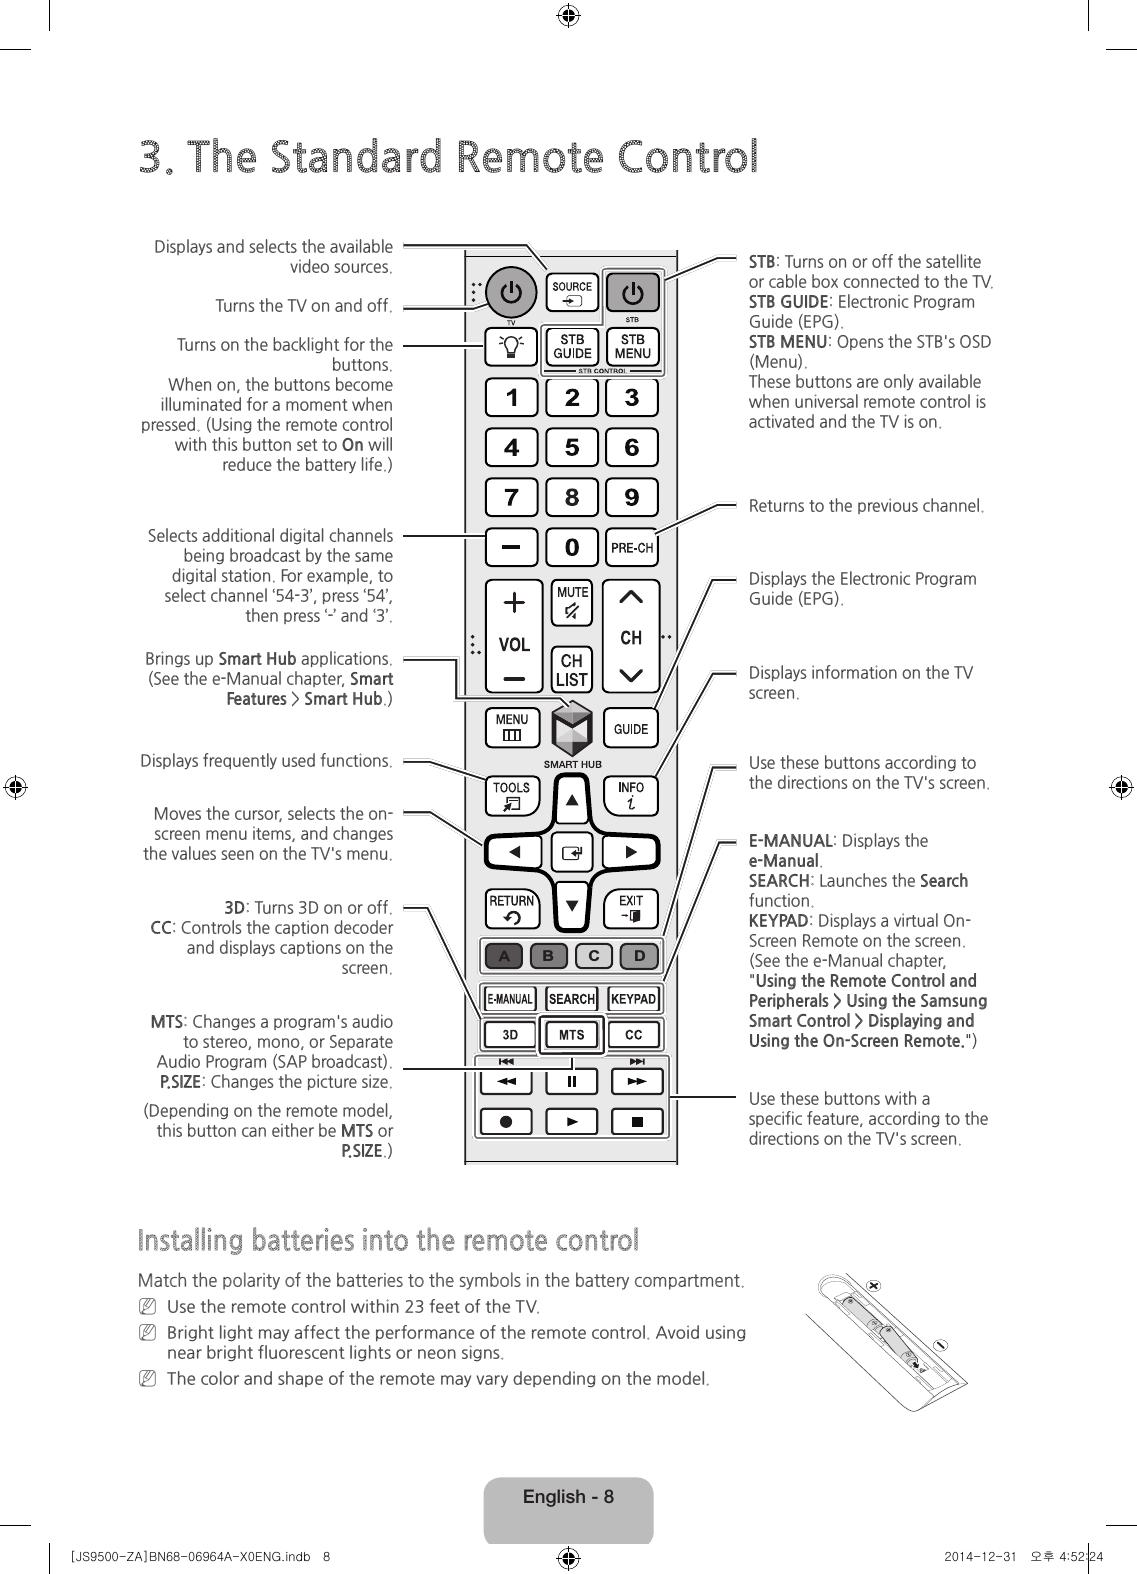 samsung electronics co rmctpj smart control user manual rh usermanual wiki samsung smart tv user manual downloads samsung smart tv user manual downloads